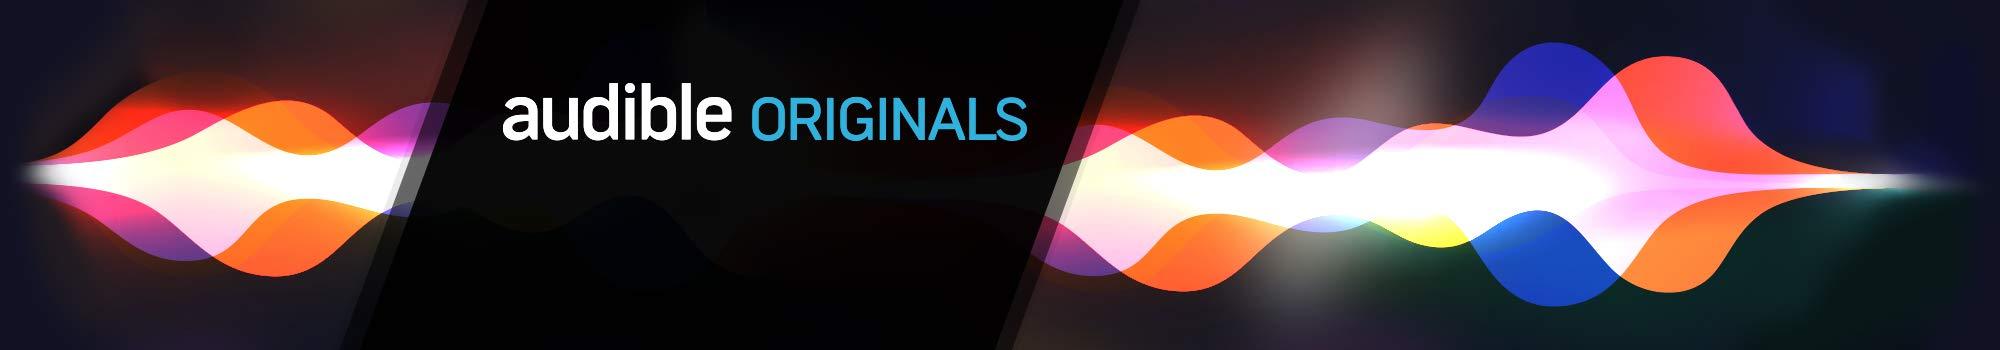 Audible Originals Member Benefit   Audible com